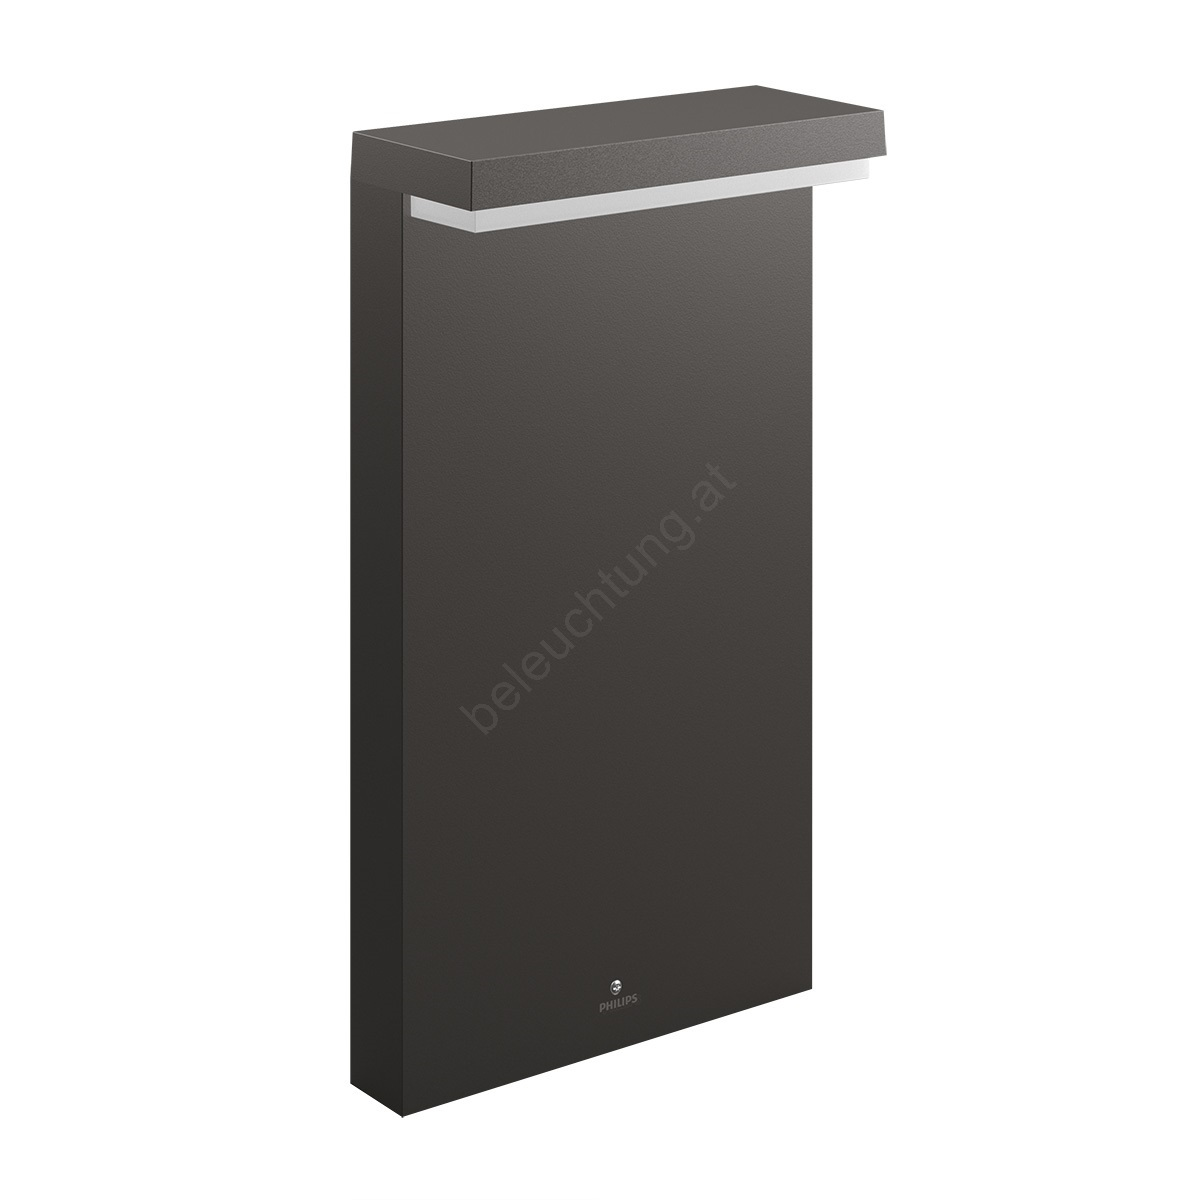 philips 16485 93 p3 led au enleuchte mygarden bustan 2xled 4 5w beleuchtung. Black Bedroom Furniture Sets. Home Design Ideas